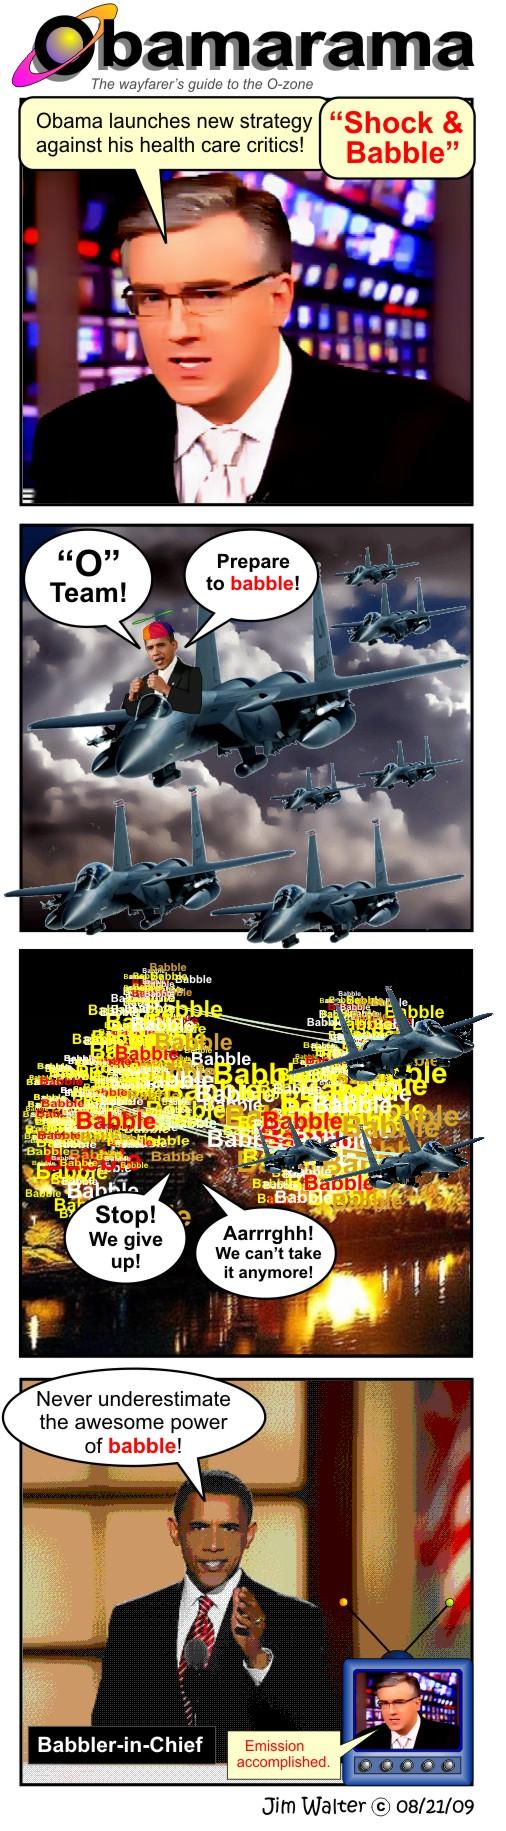 090820 - Shock-n-Babble